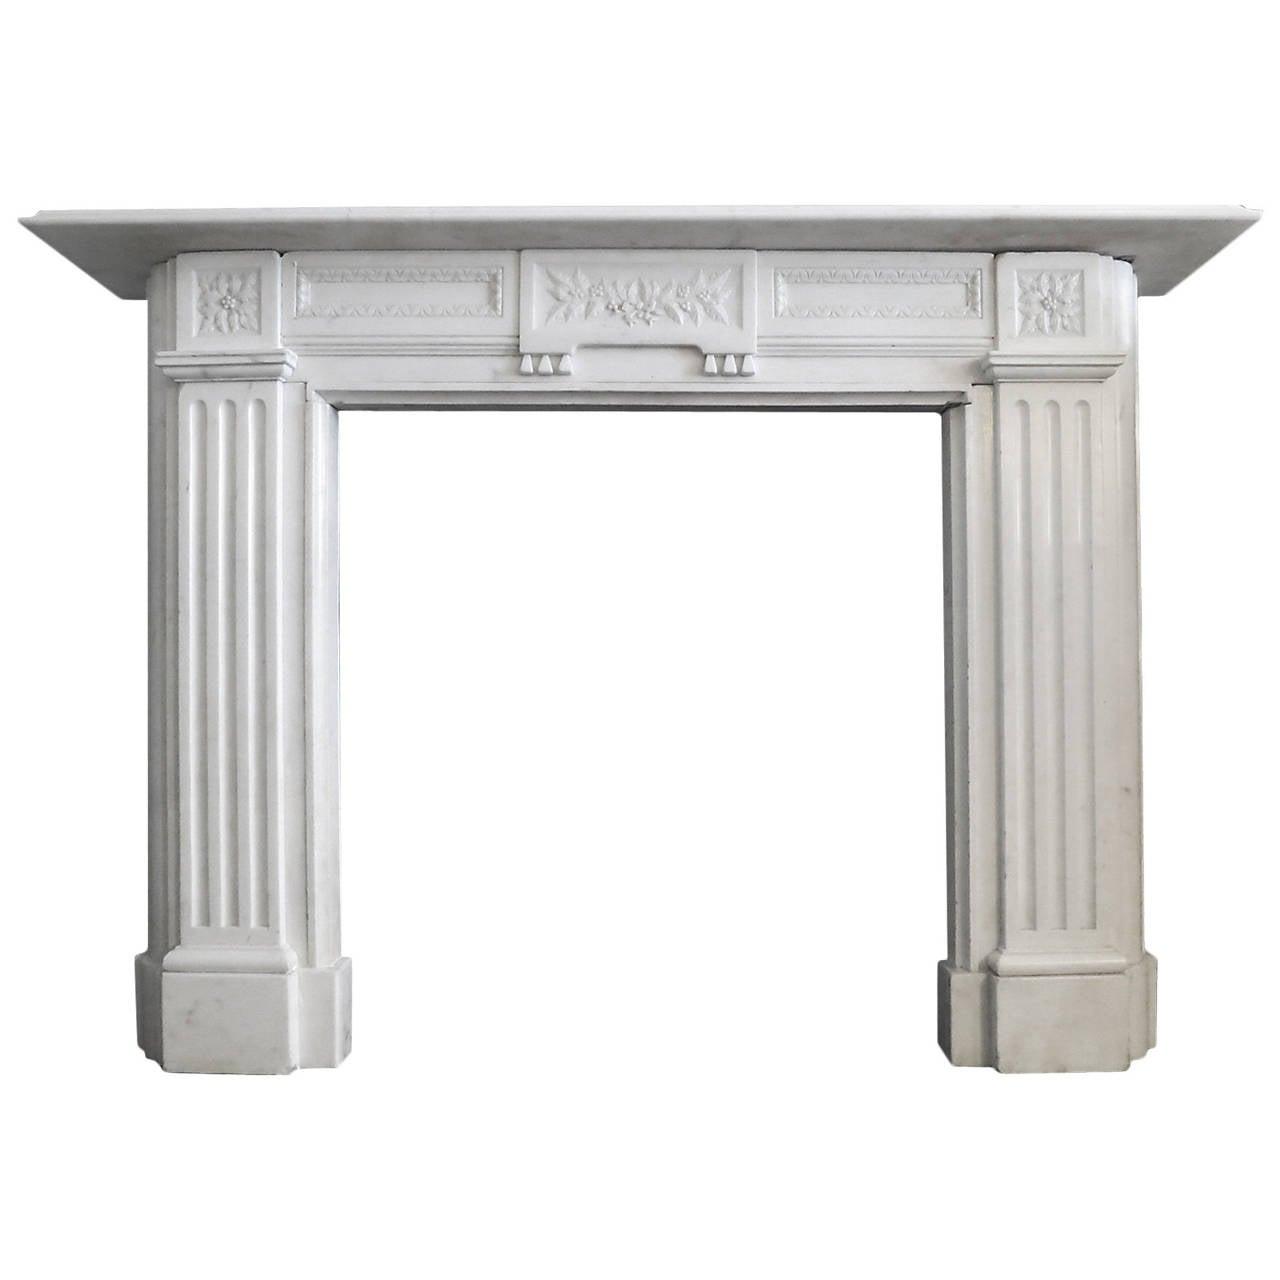 Antique Regency Style Statuary White Marble Fireplace Mantel